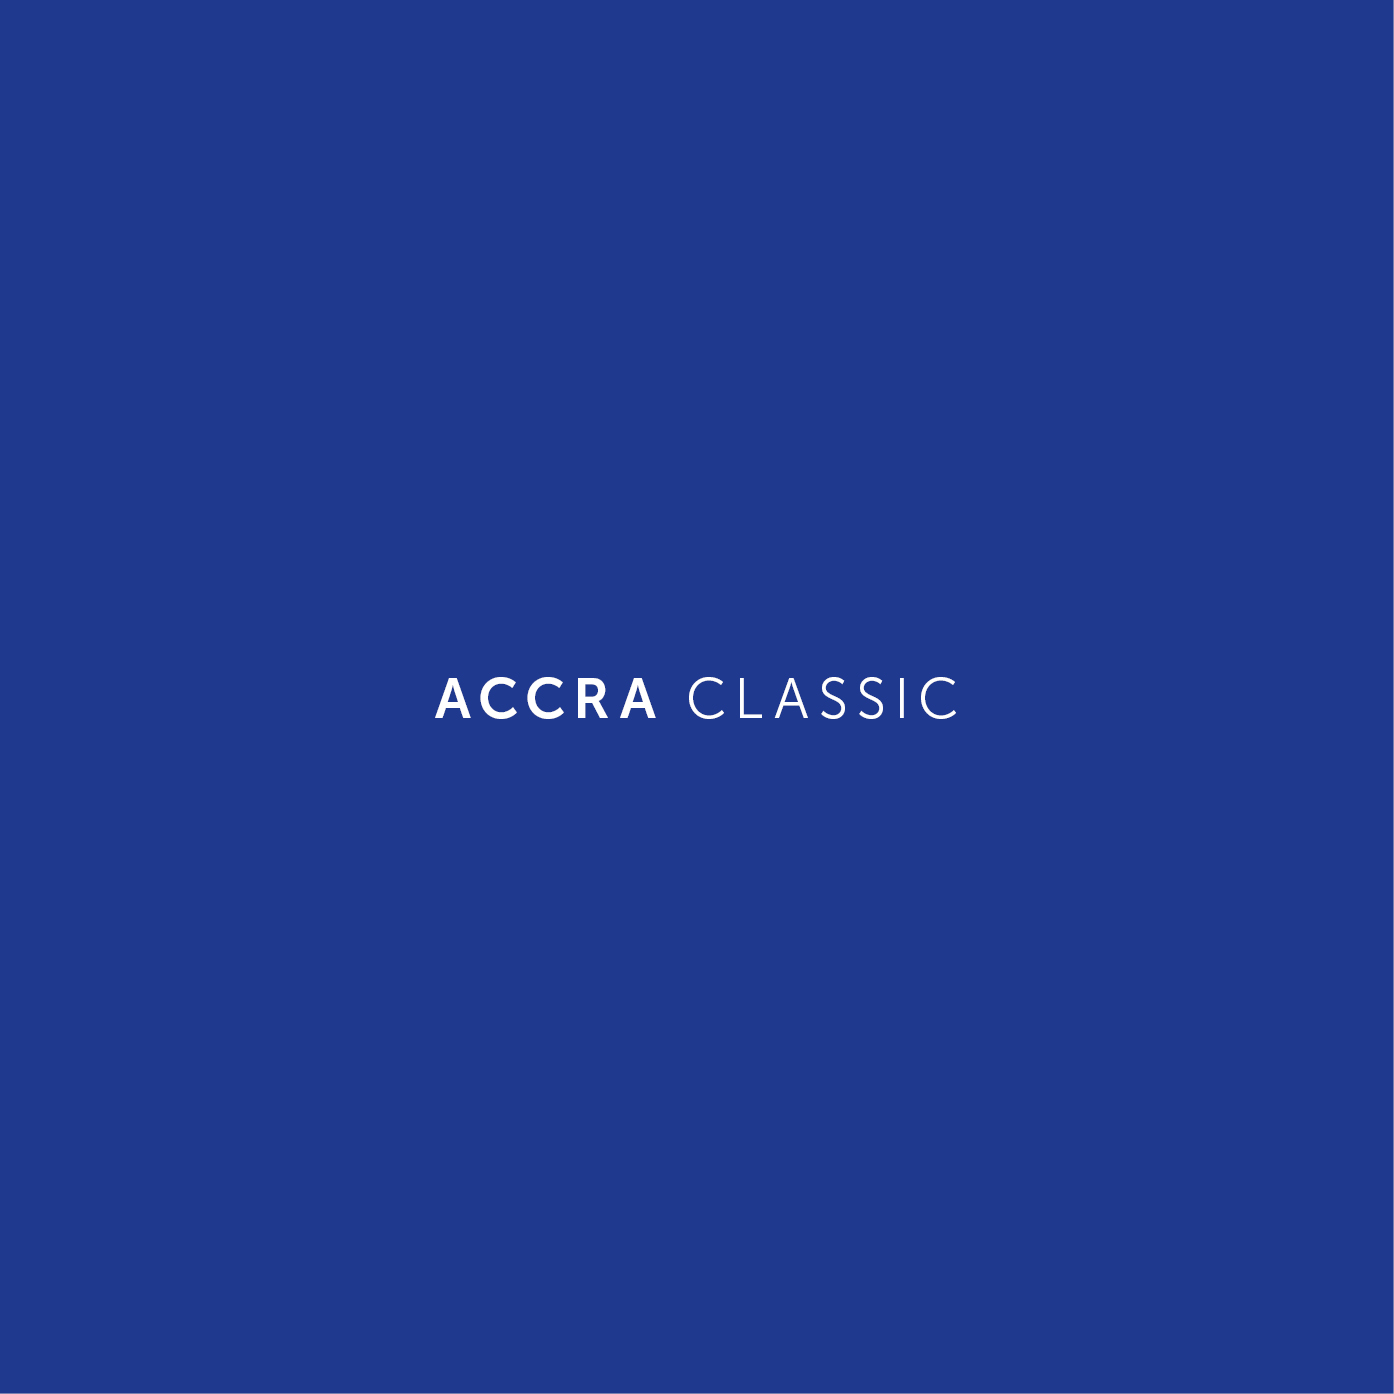 AccraClassic-Title-02.jpg